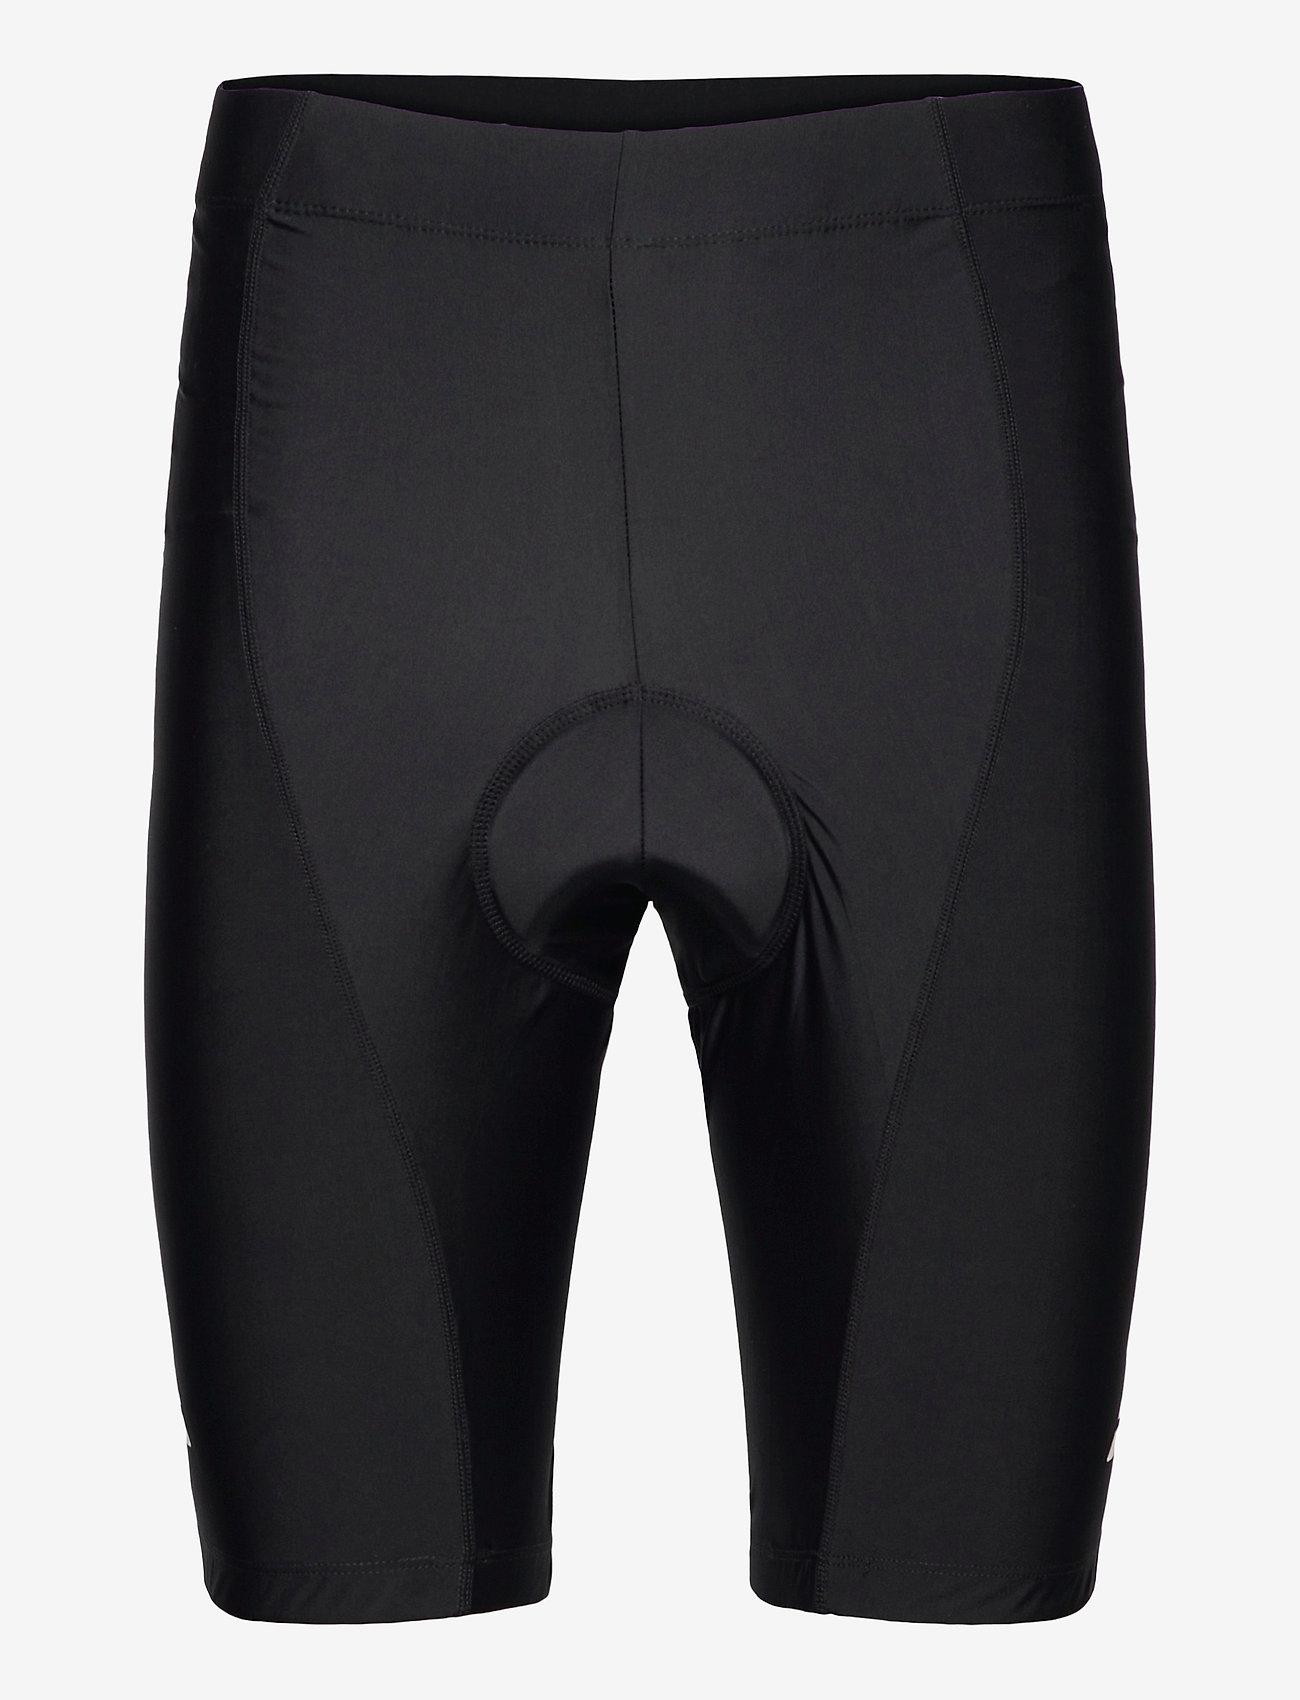 Danish Endurance - Mens Cycling Shorts 1 Pack - wielrenshorts & -leggings - black/black - 0